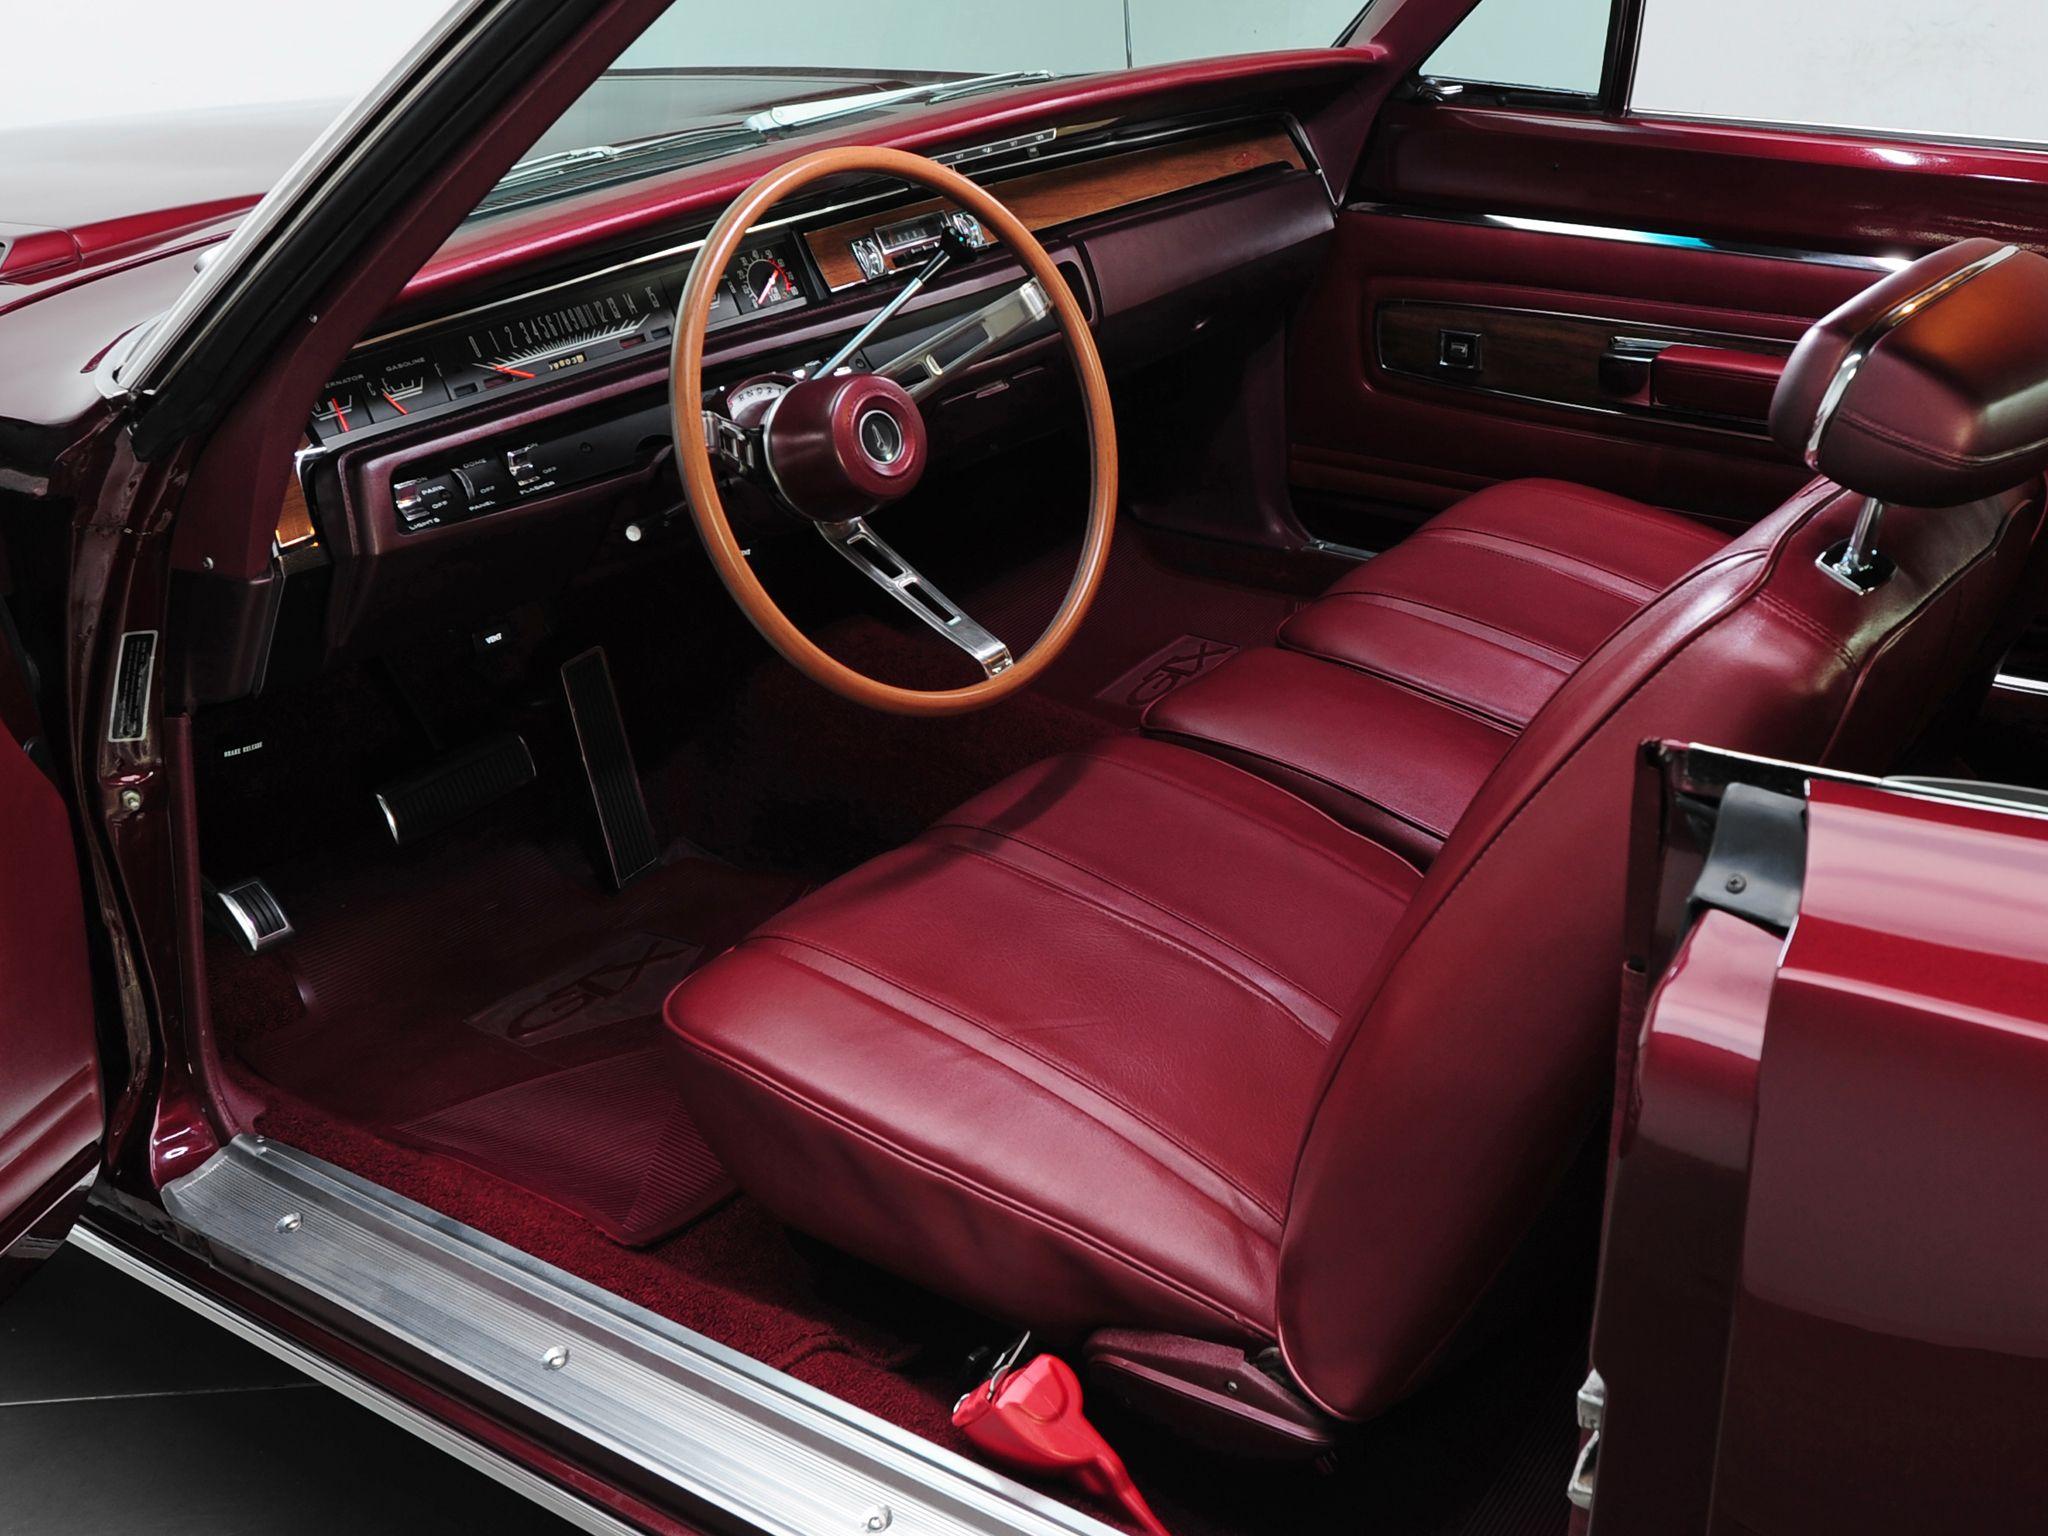 1968 PLYMOUTH ROAD RUNNER 2 DOOR HARD TOP - 97036   1968 Plymouth Road Runner Interior